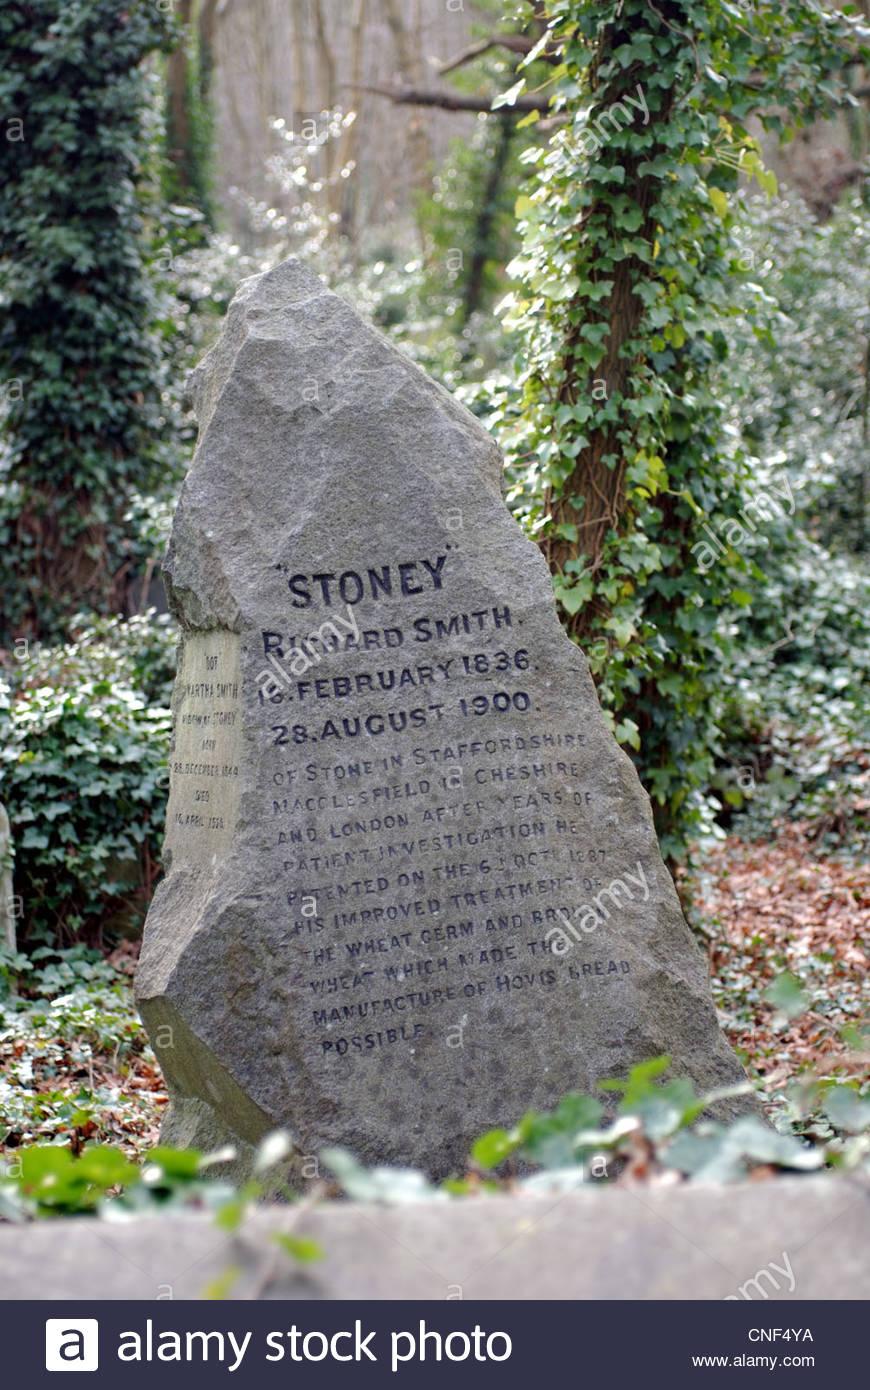 London United Kingdom Highgate Cemetery Grave of Richard 'Stoney' Smith inventor of 'Hovis' - Stock Image